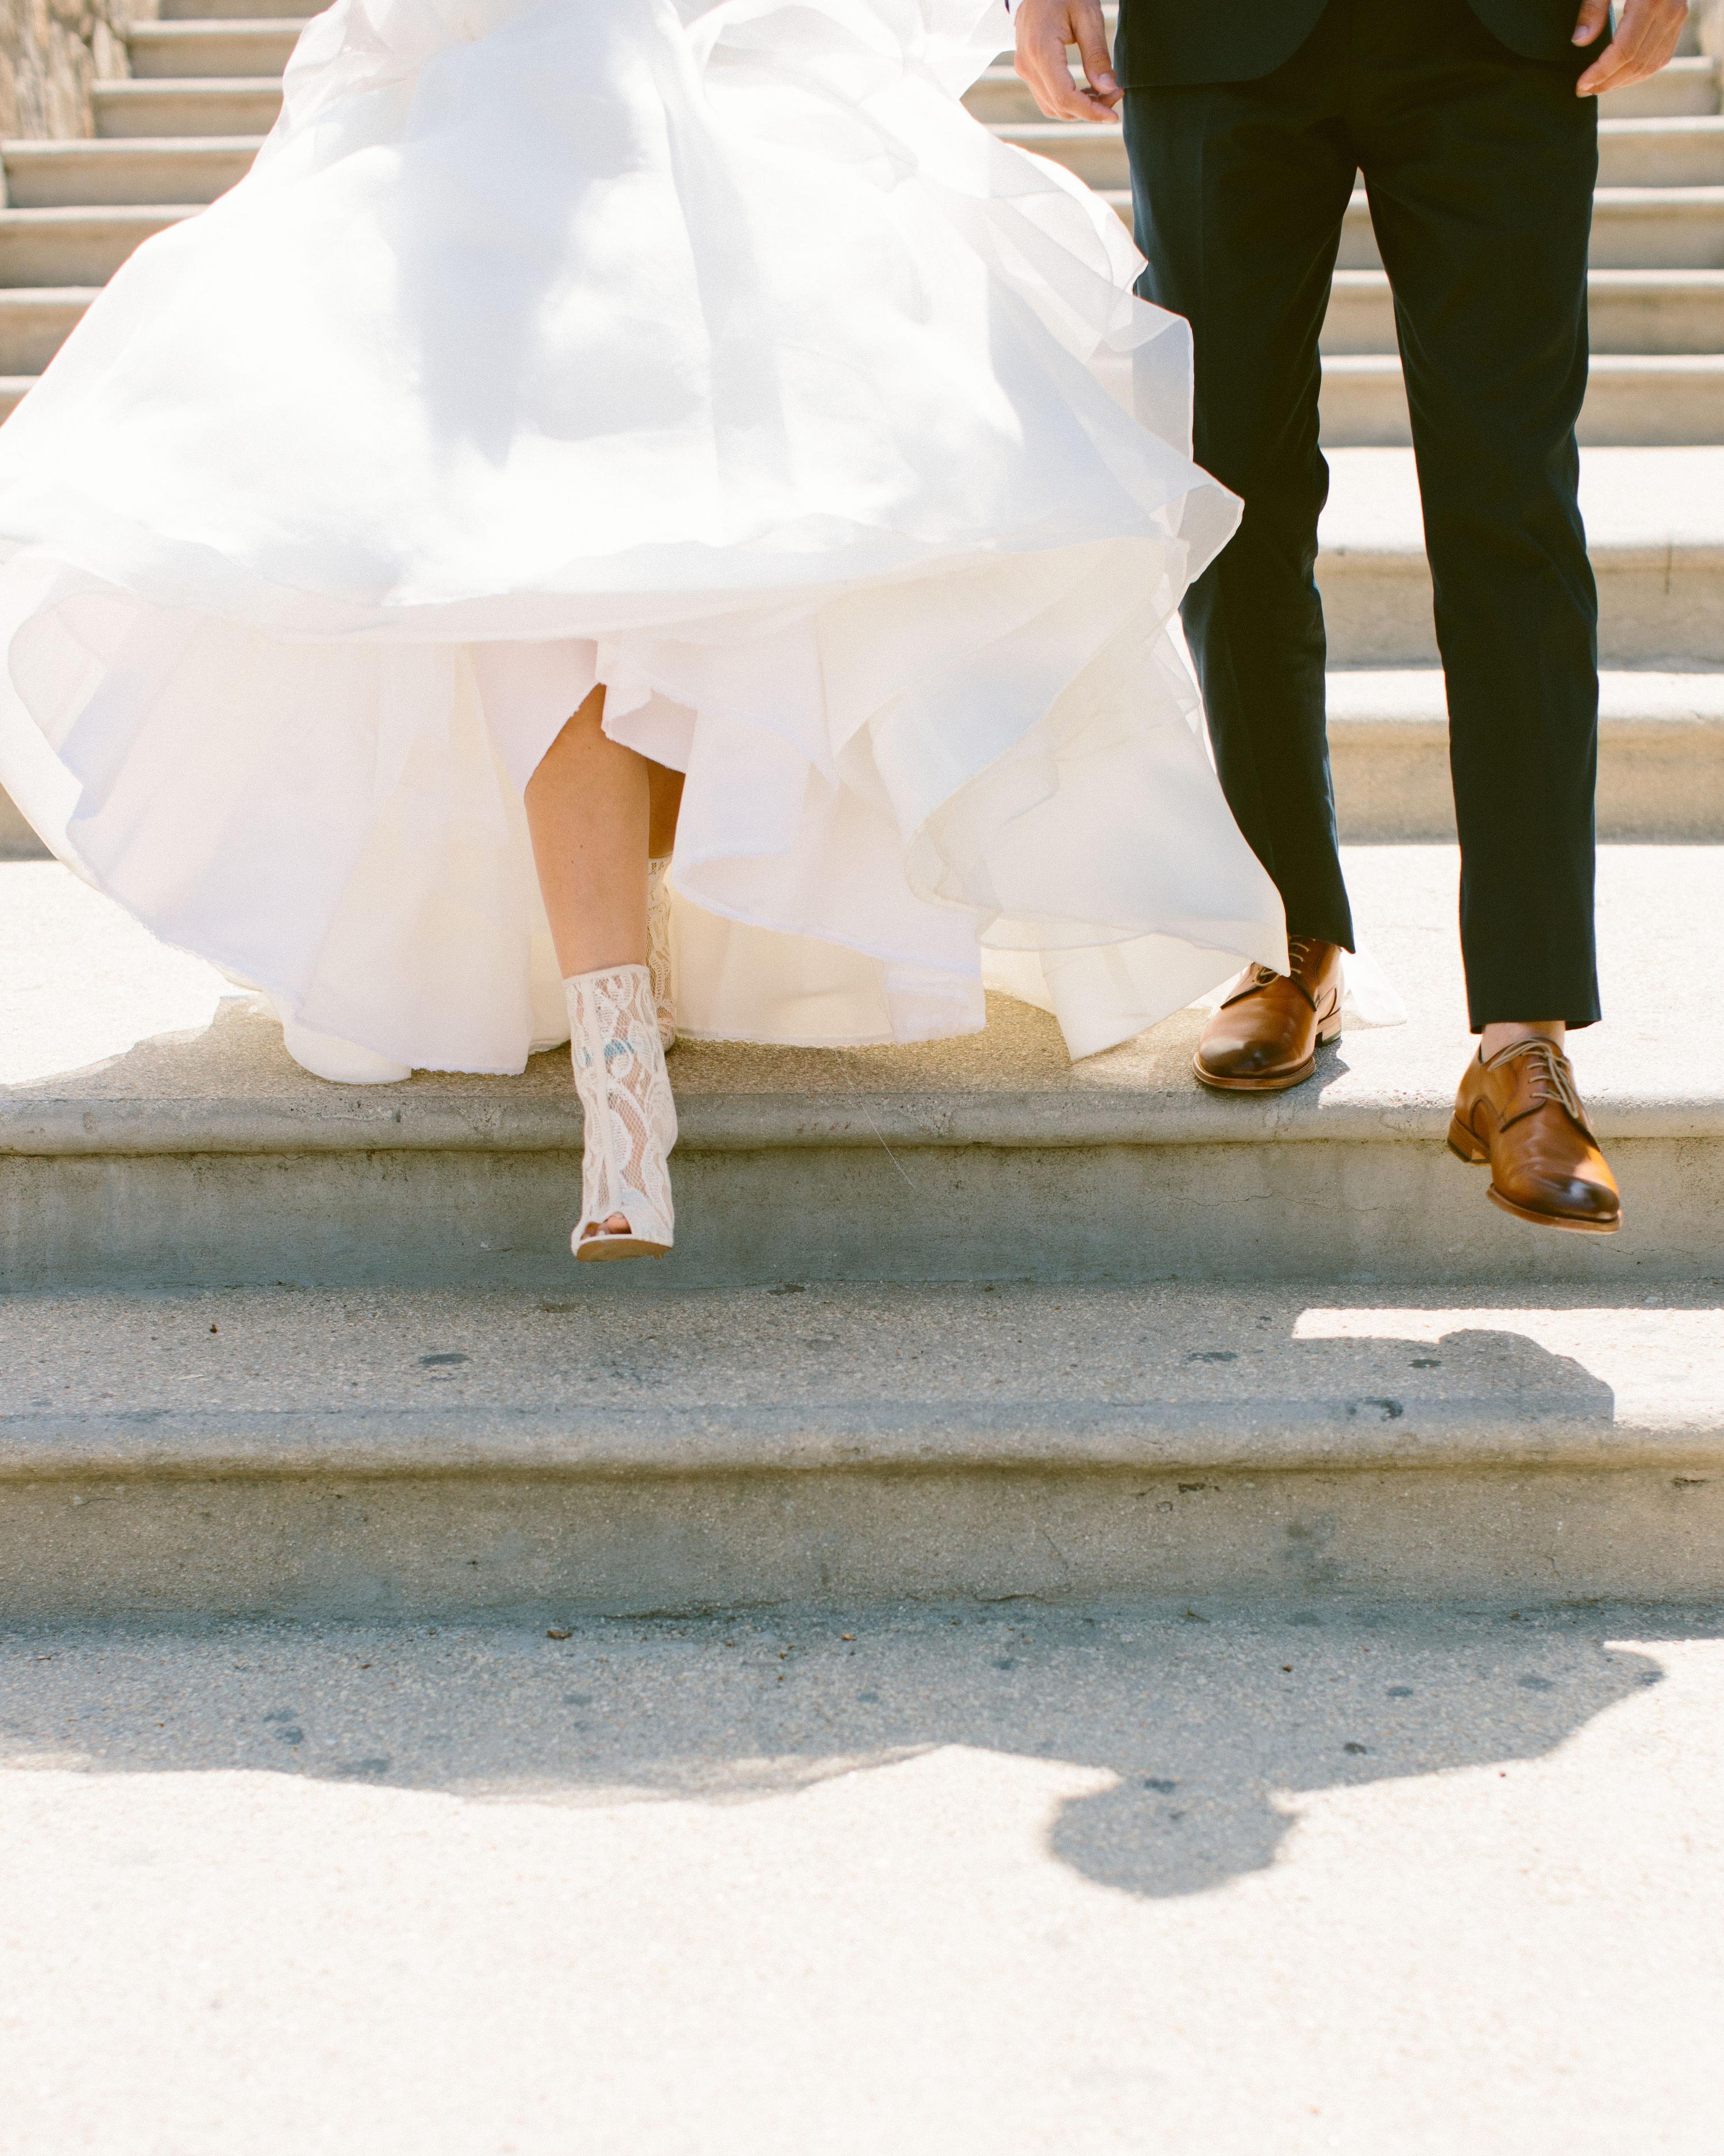 ali-jess-wedding-shoes-061-002-s111717-1214.jpg